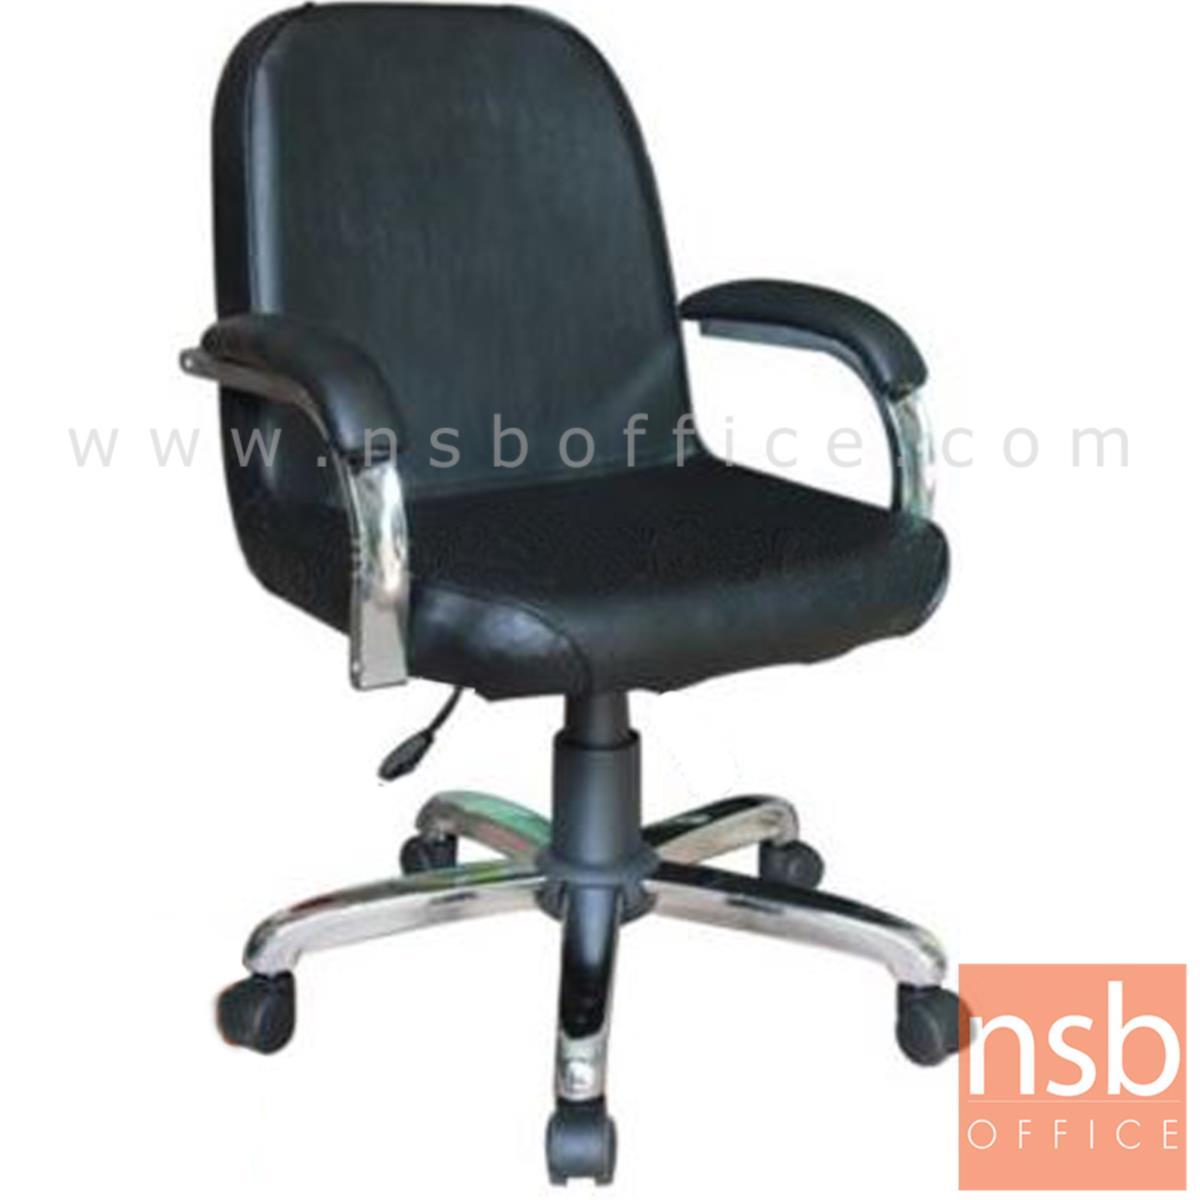 B03A087:เก้าอี้สำนักงาน รุ่น Stockhard (สต็อกฮาร์ท)  โช๊คแก๊ส ขาเหล็กชุบโครเมี่ยม